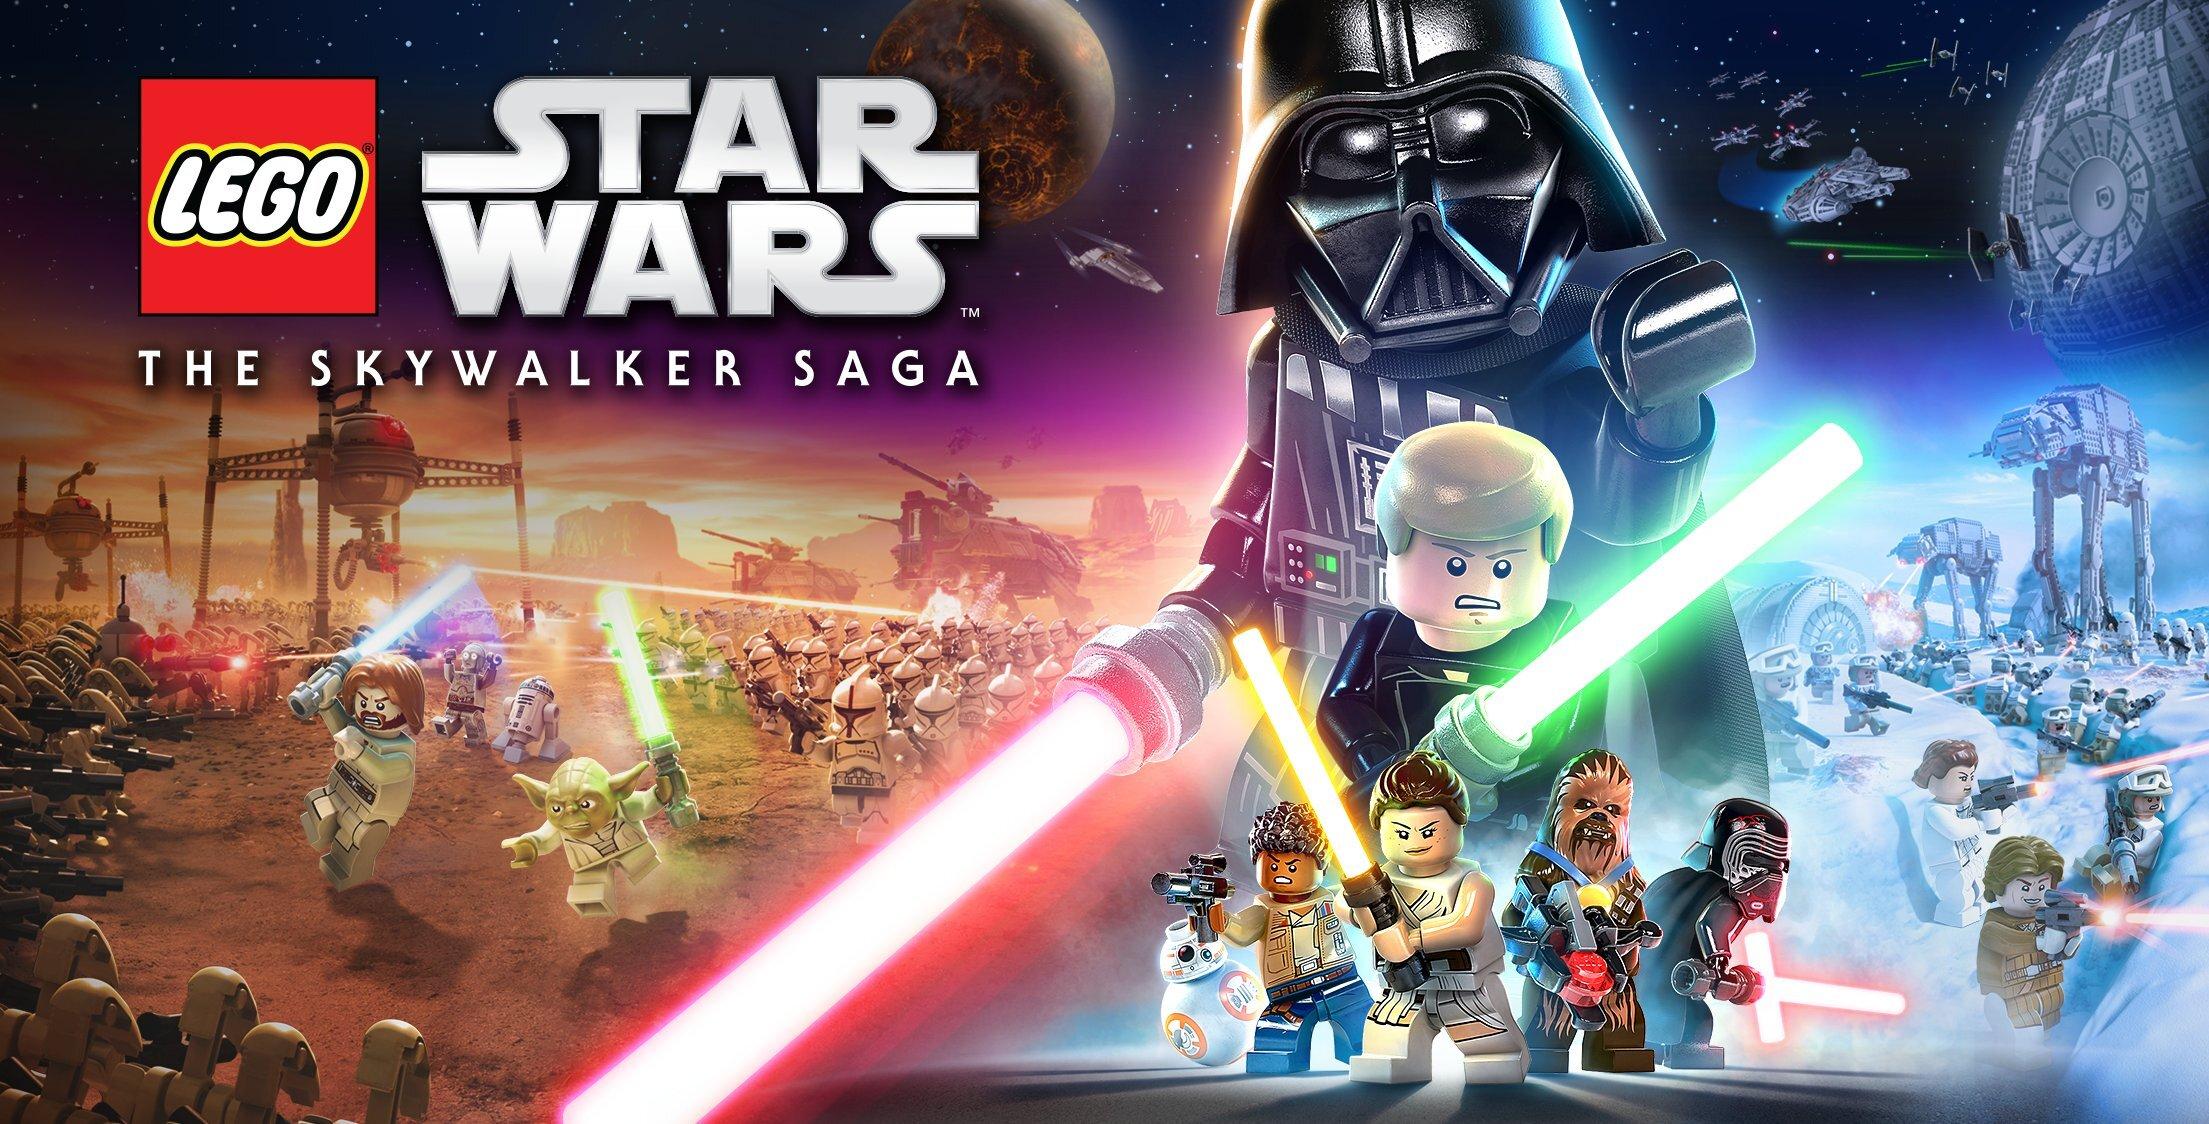 LEGO Star Wars : La Saga Skywalker sortira au printemps 2021 15885910